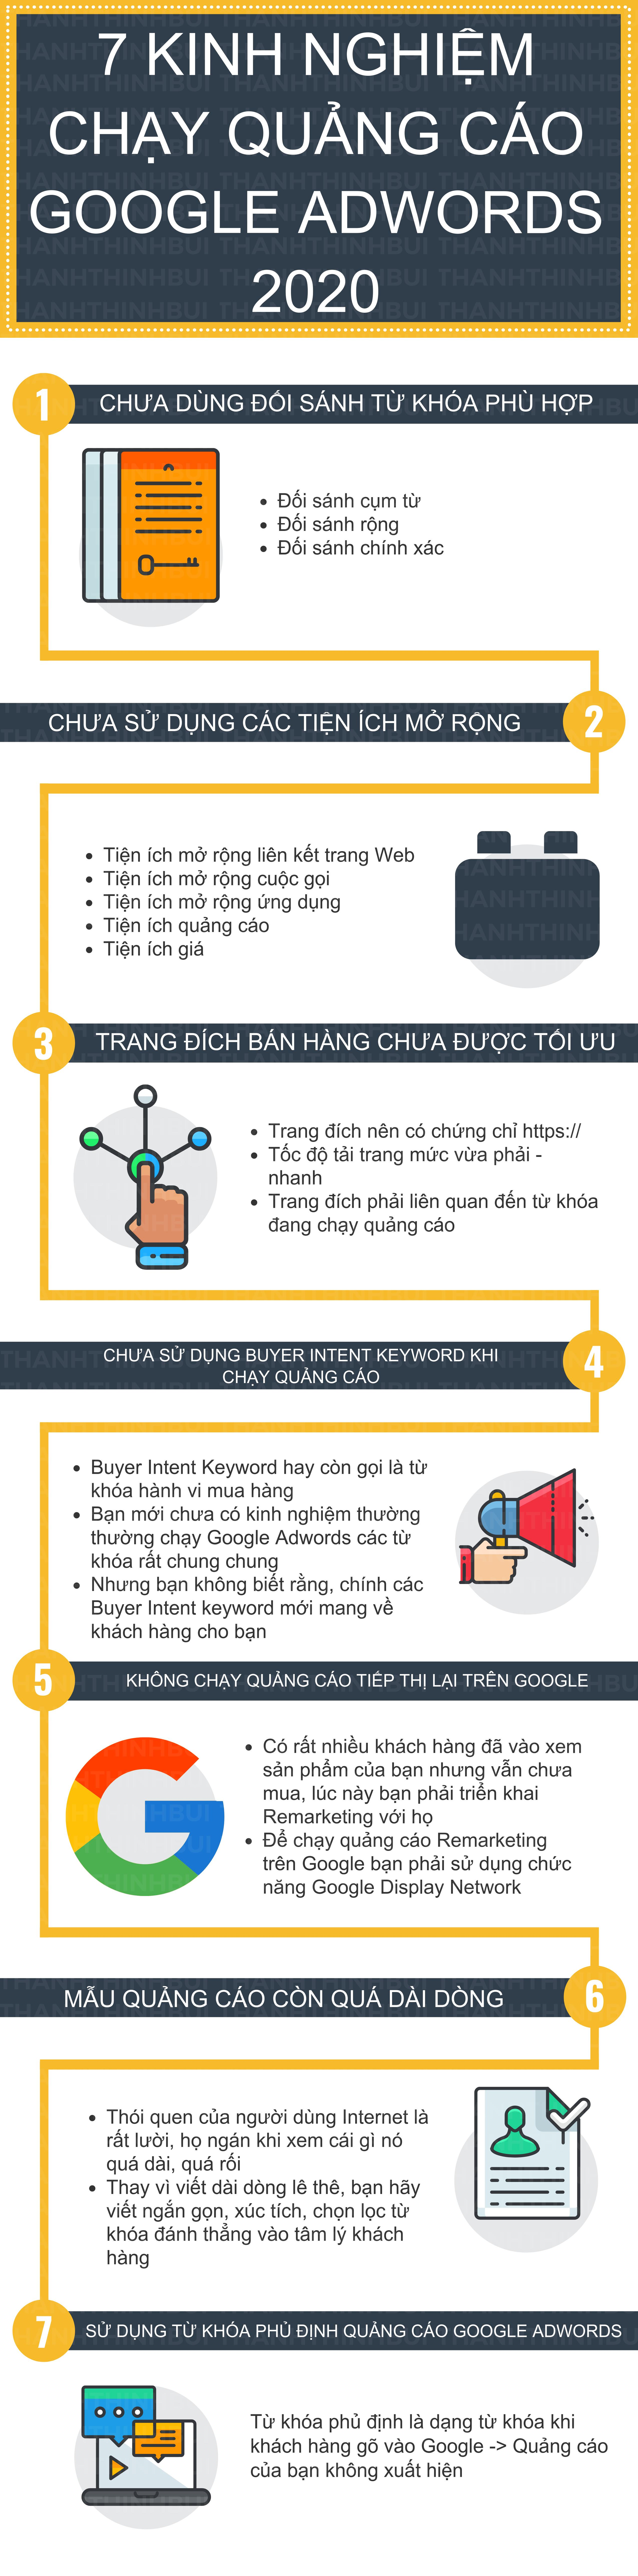 7-kinh-nghiem-chay-quang-cao-google-adwords-2020